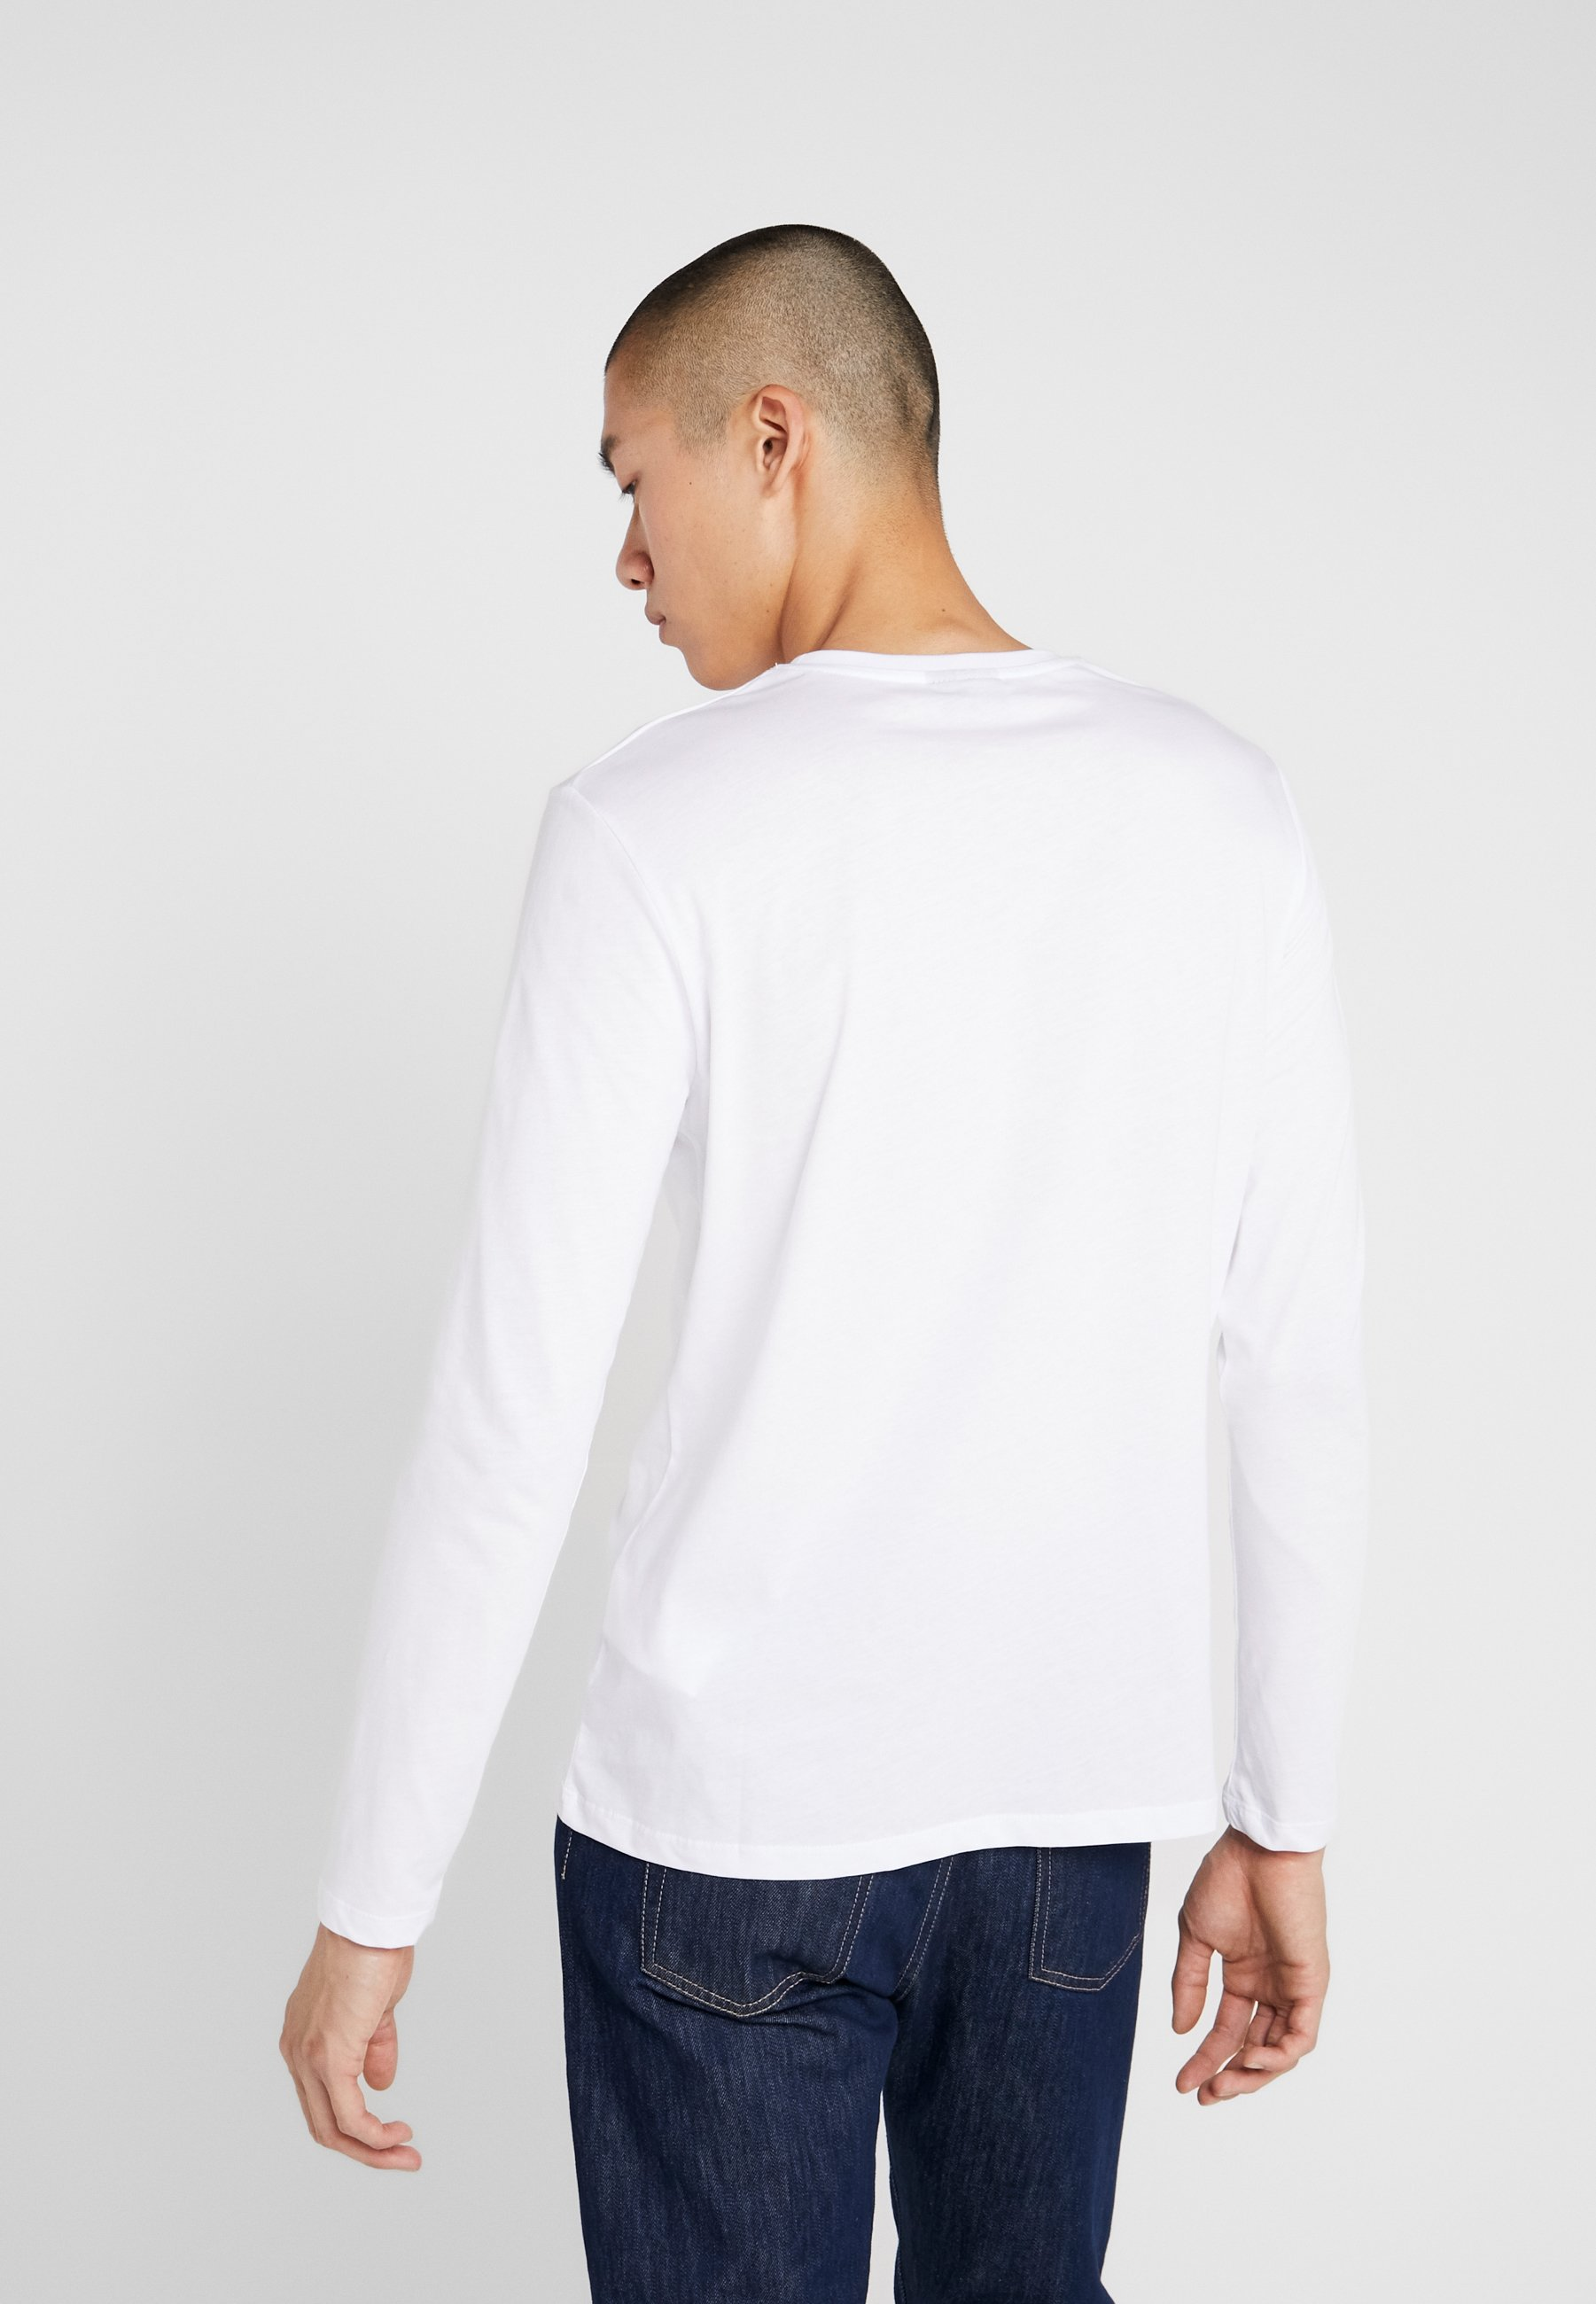 Longues LongsleeveT Manches À Karl shirt White Lagerfeld mnv8wONy0